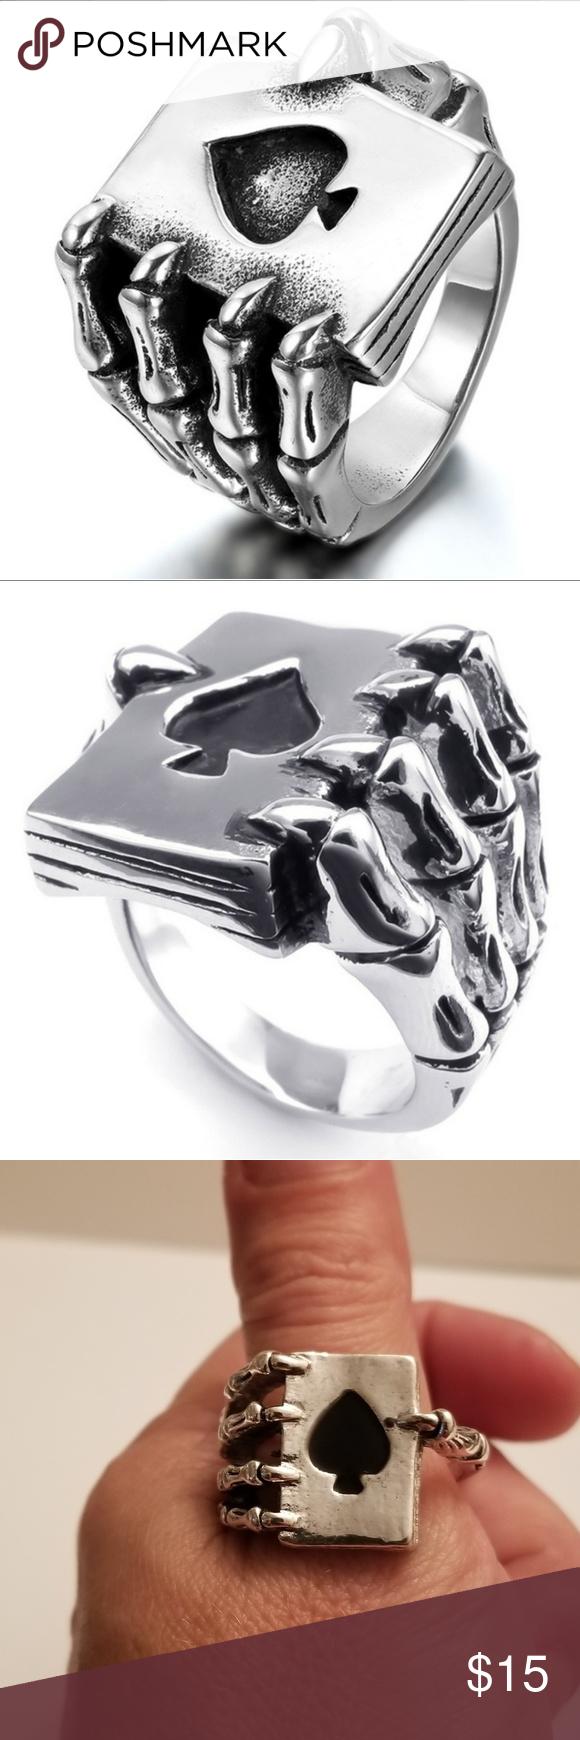 last 1 sz 13.5 Skeleton Hand Ring Emo jewelry, Hand ring